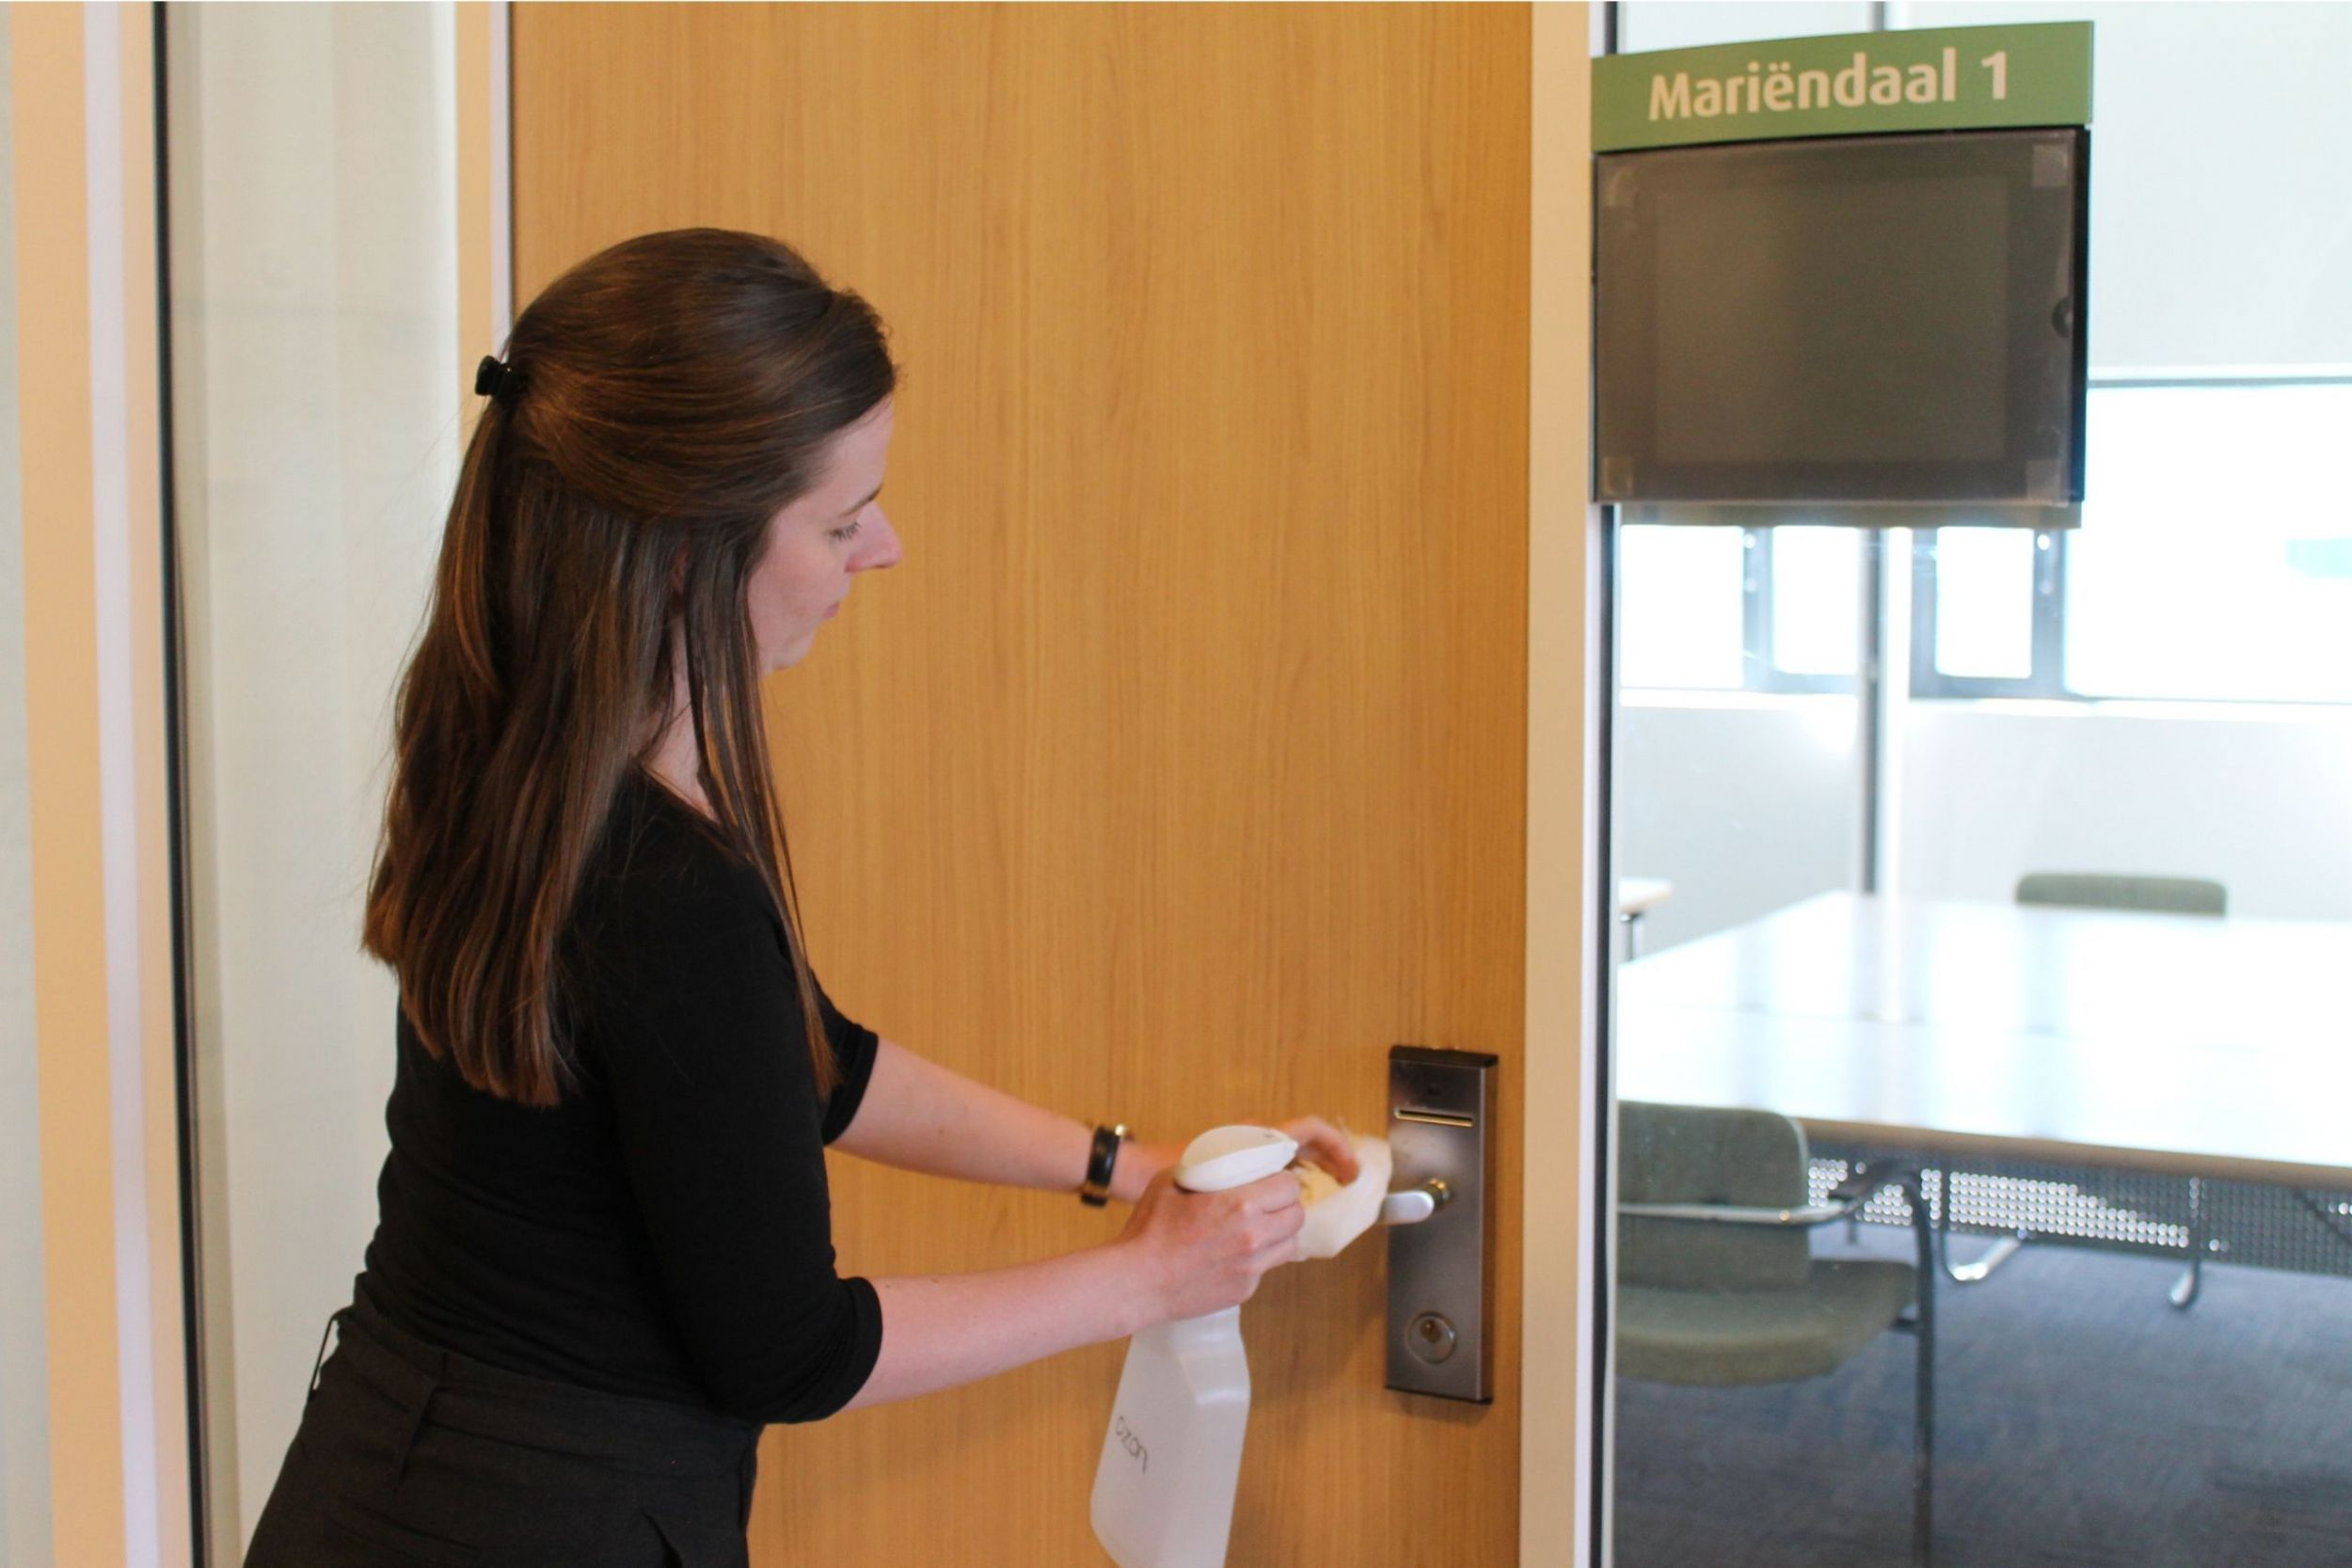 Meeting Operations hygienics